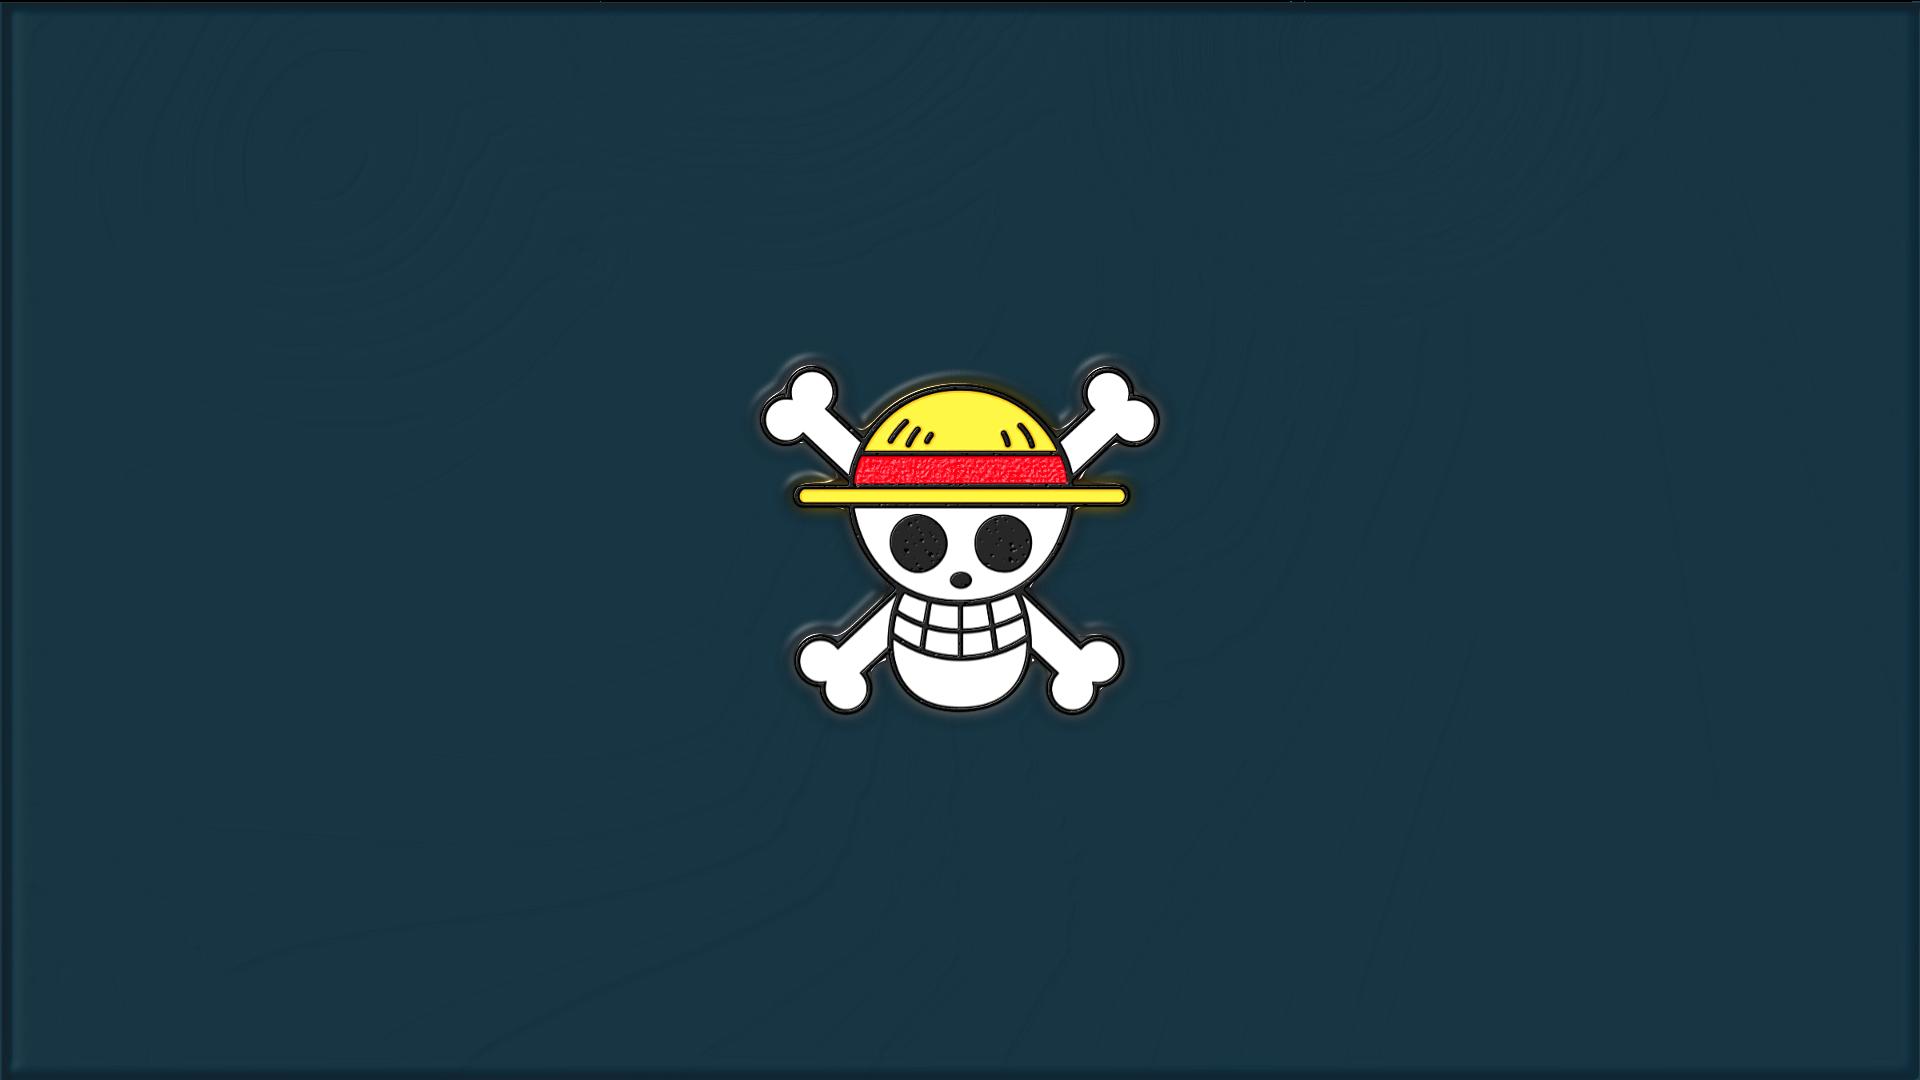 One Piece wallpaper - 828886